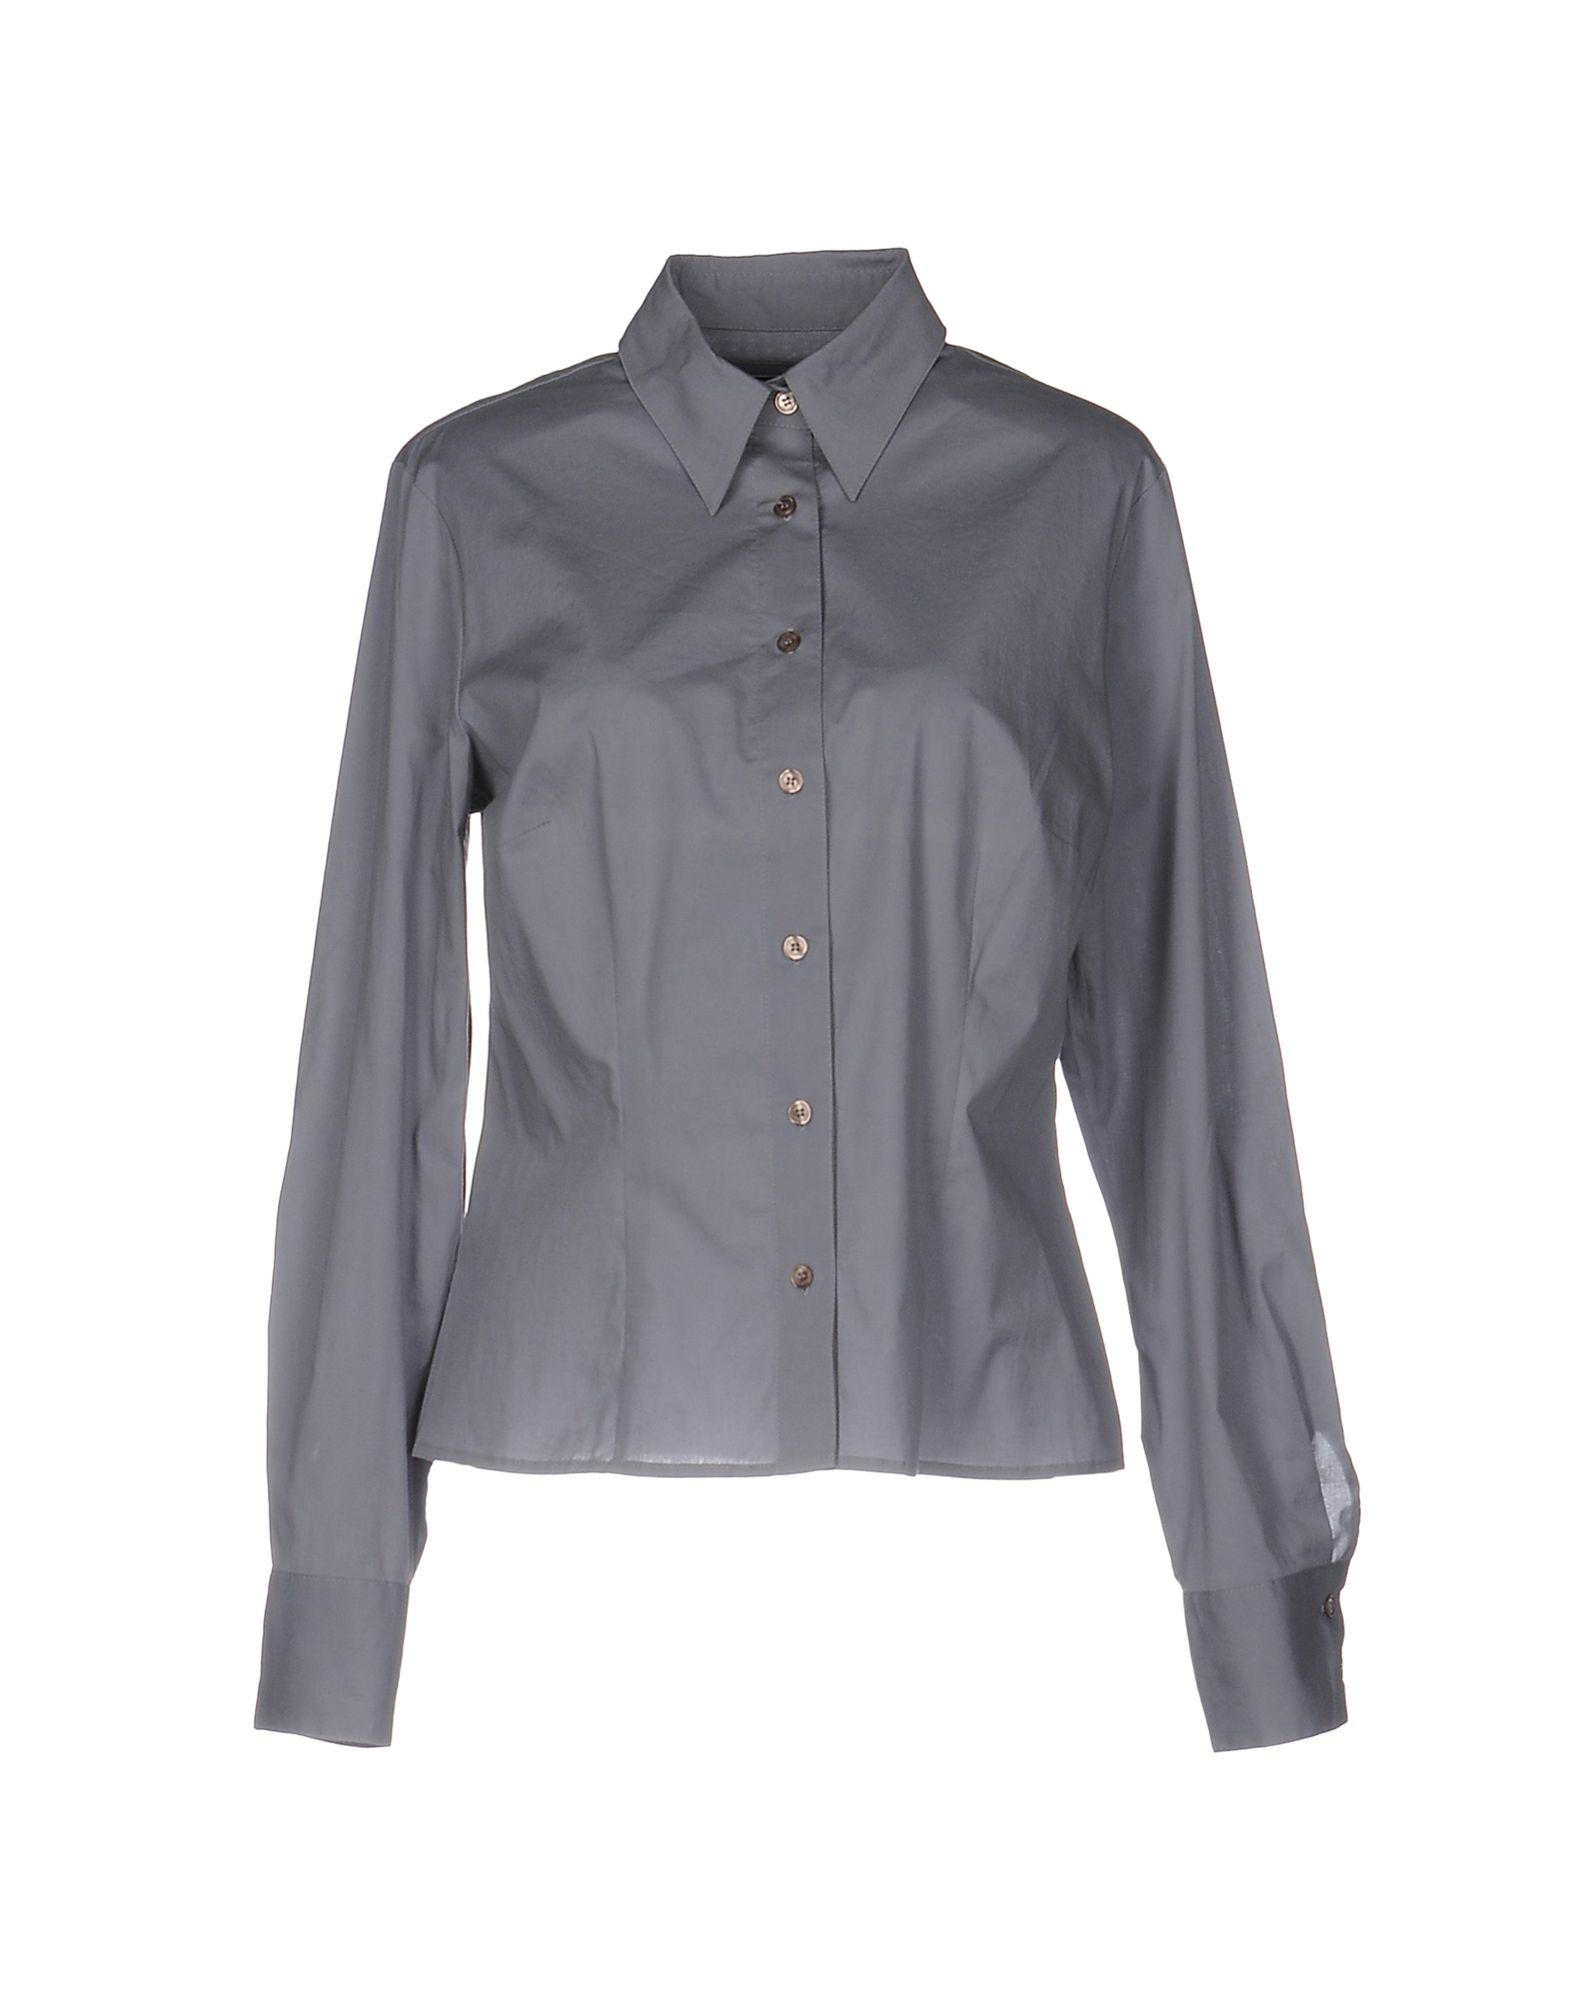 caractère aria куртка CARACTÈRE ARIA Pубашка